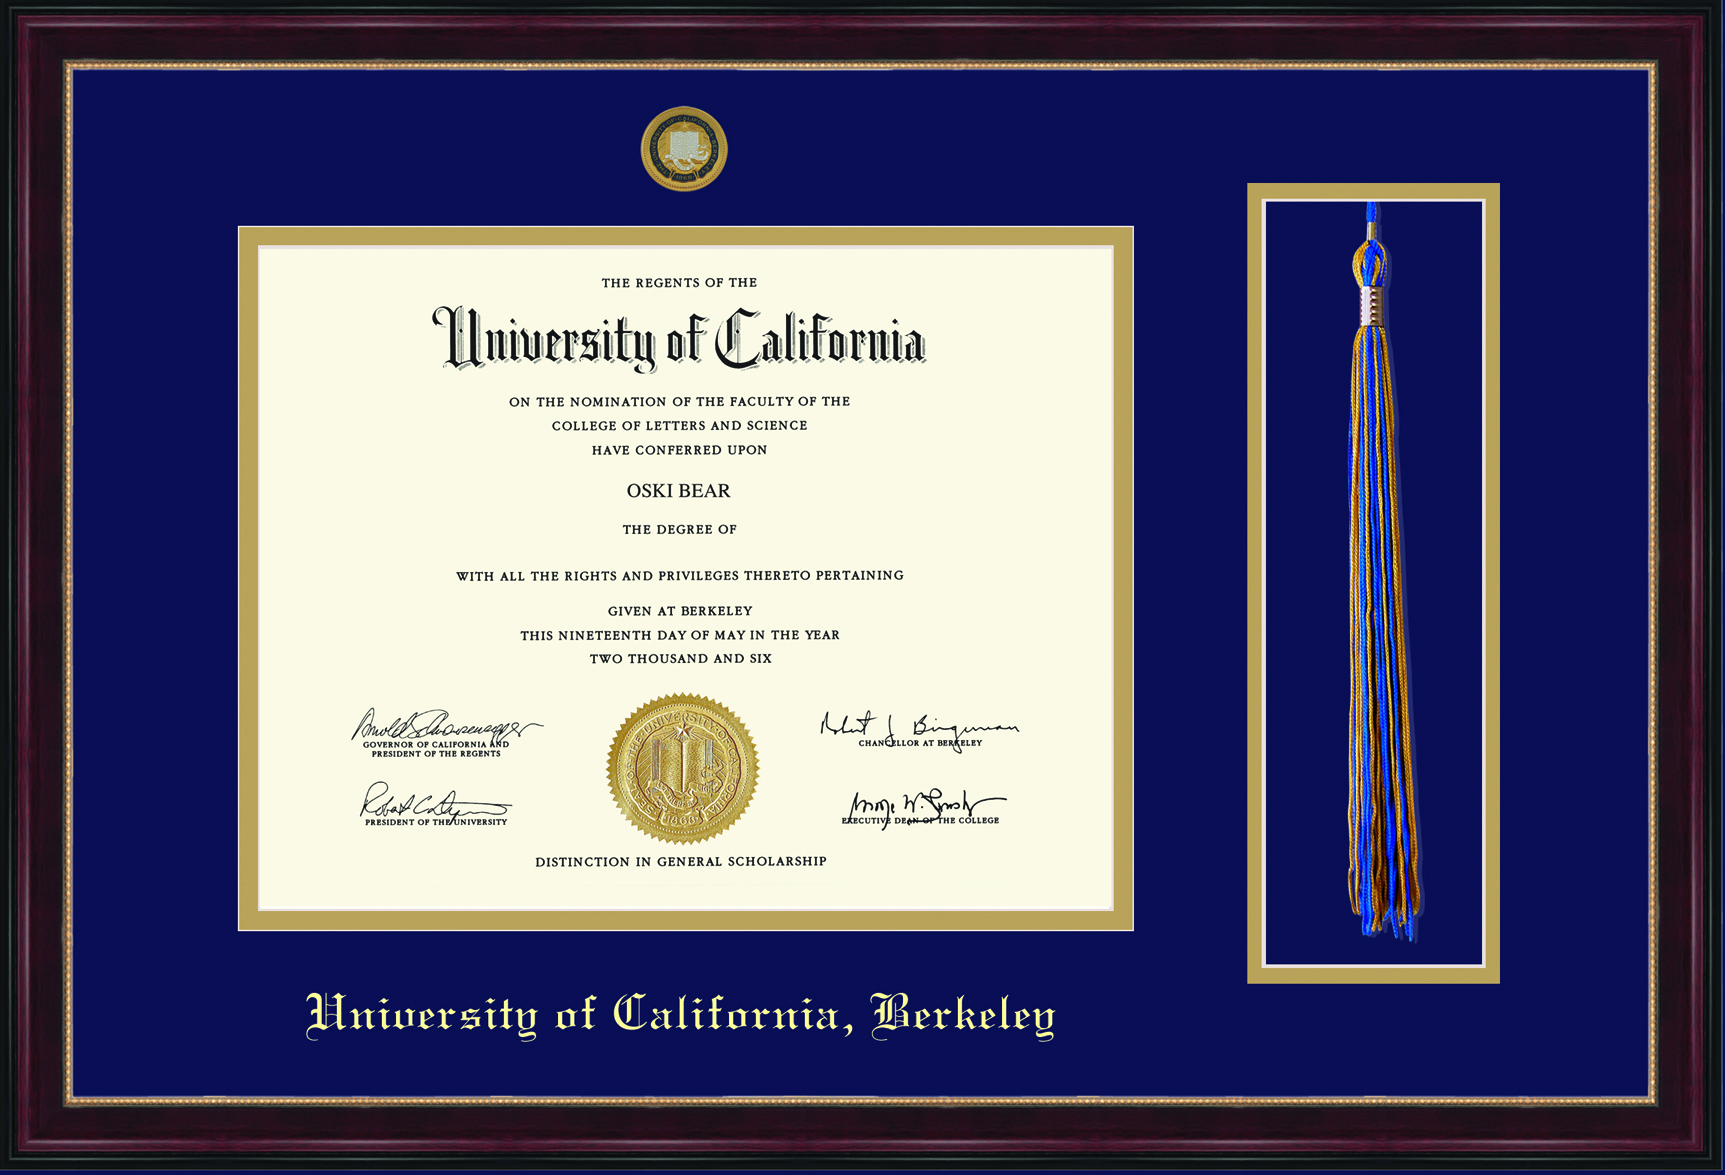 Diploma Frame Sienna Tassel